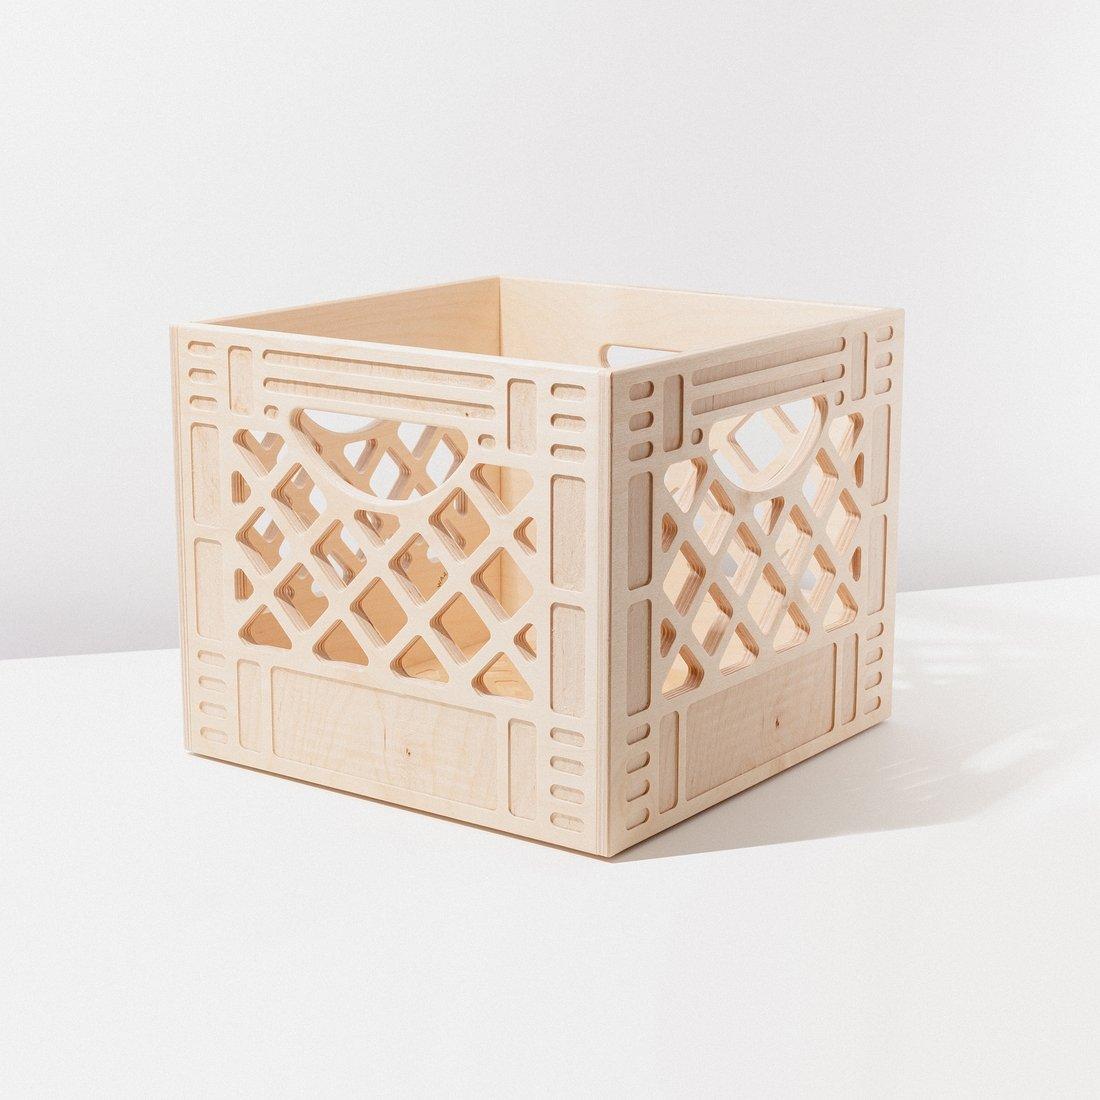 Image of WAAM Wooden Milk Crate-Standard Square